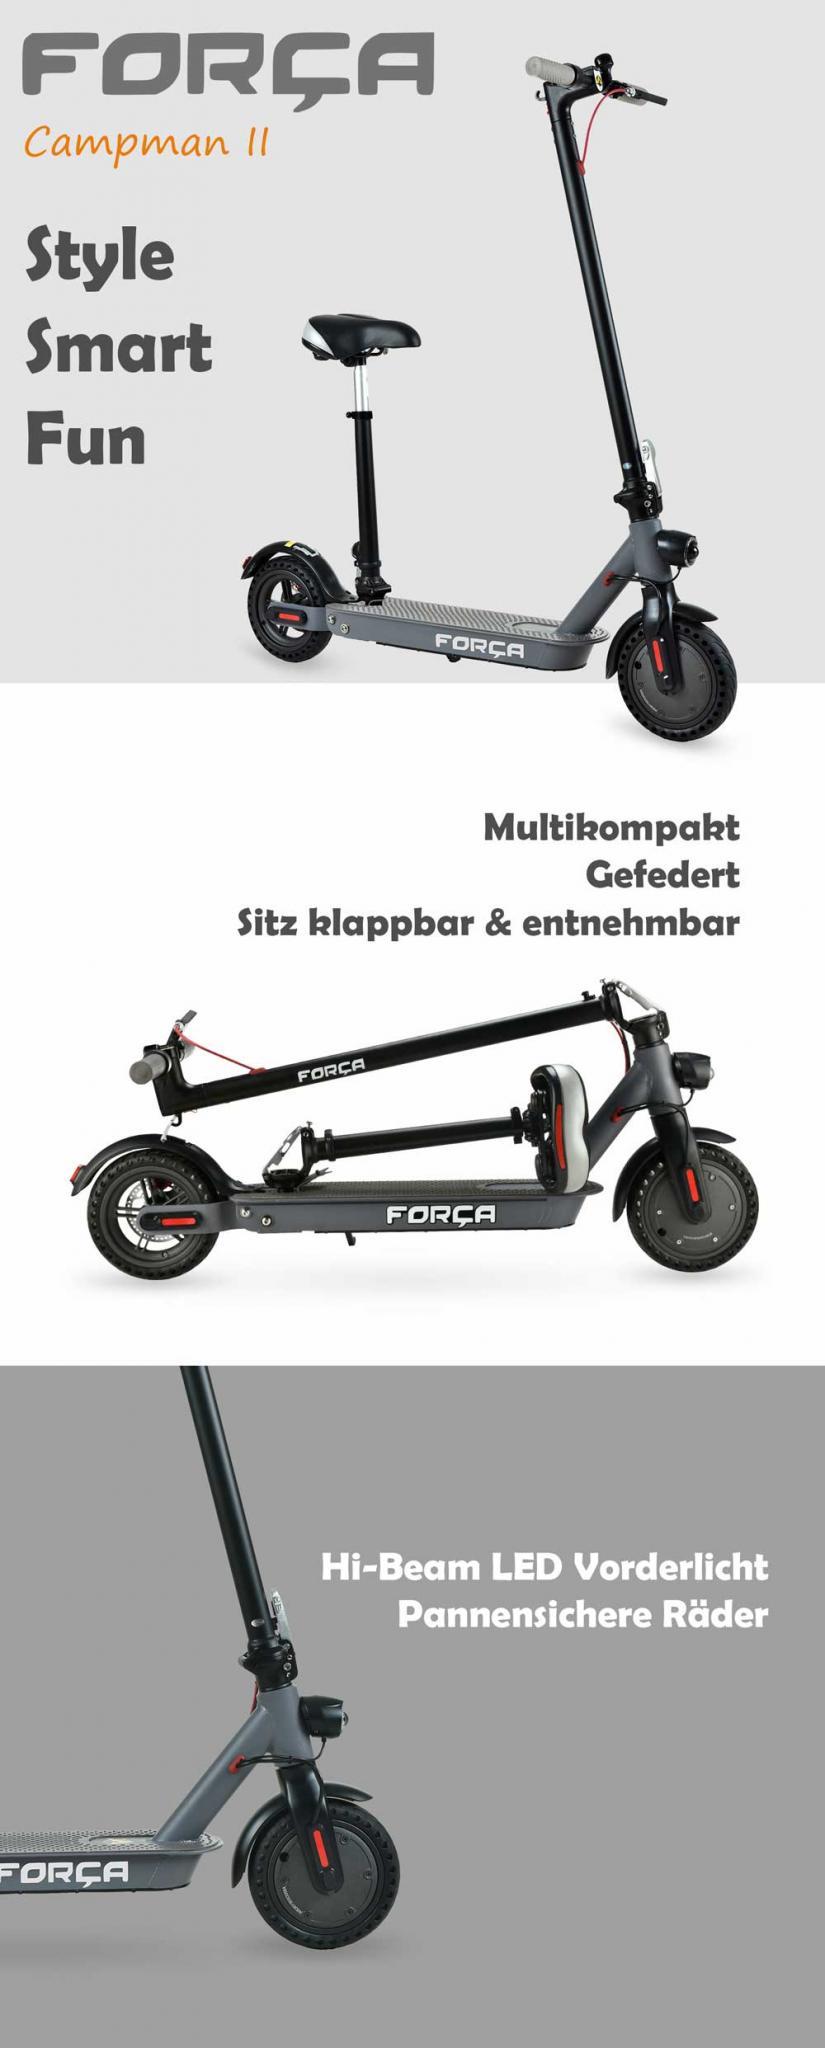 Forca-Campman-II-Mini-Elektroroller-1